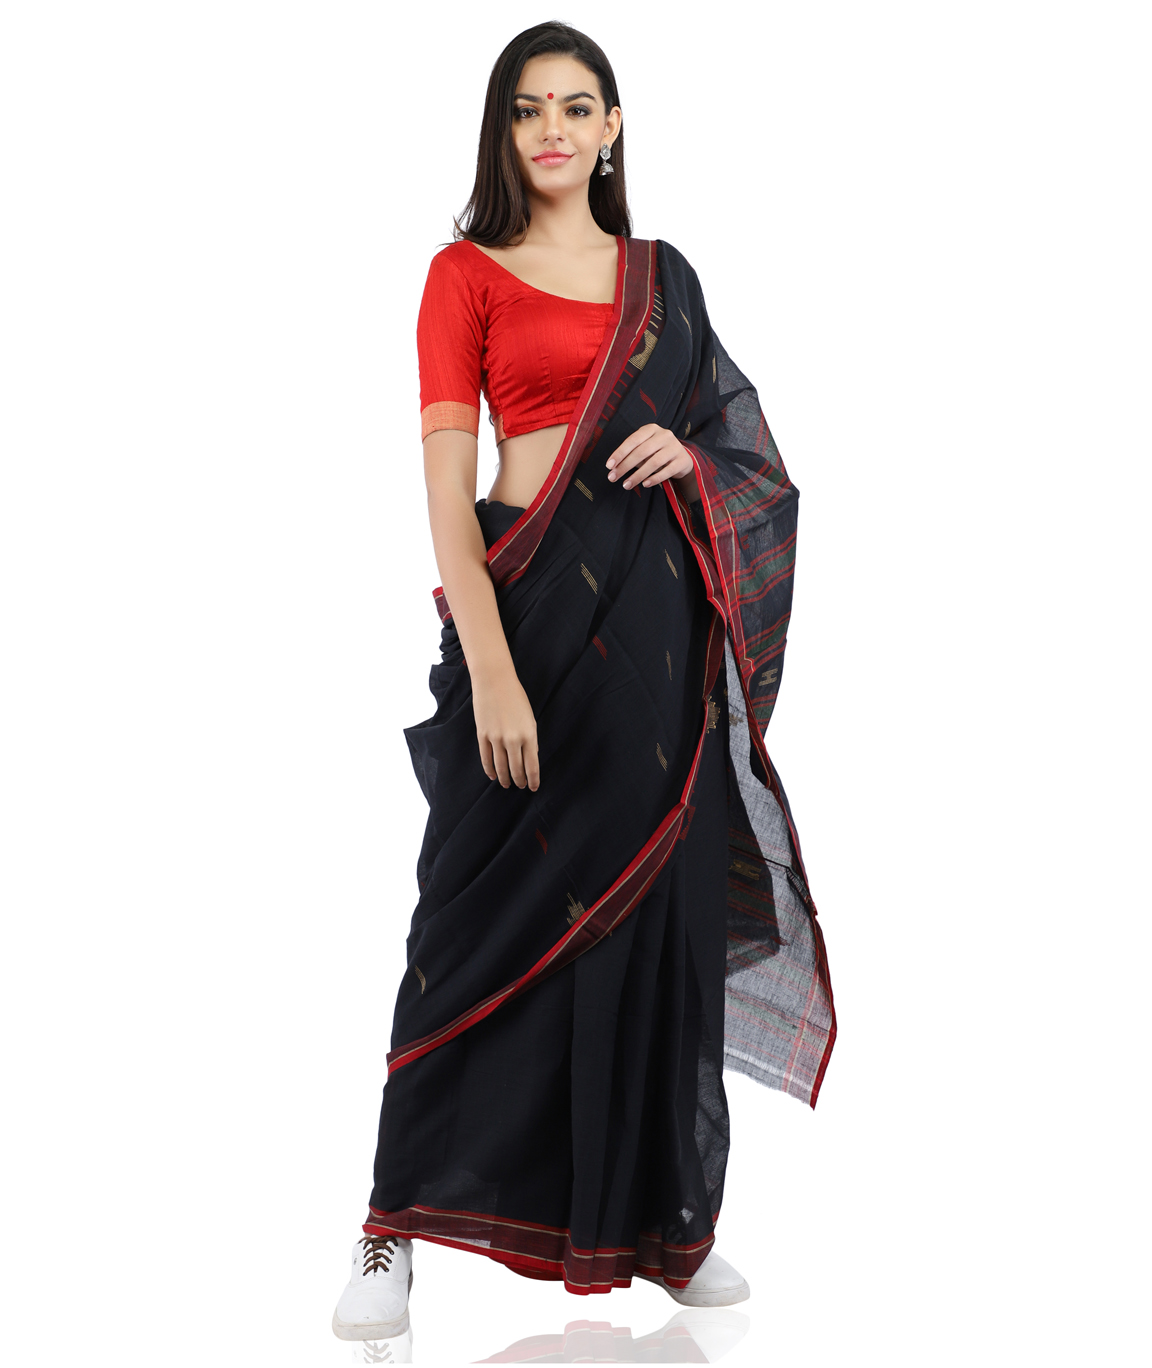 Handloom Pure Cotton Black Saree With Jamdani Woven(COLOUR : BLACK & RED)